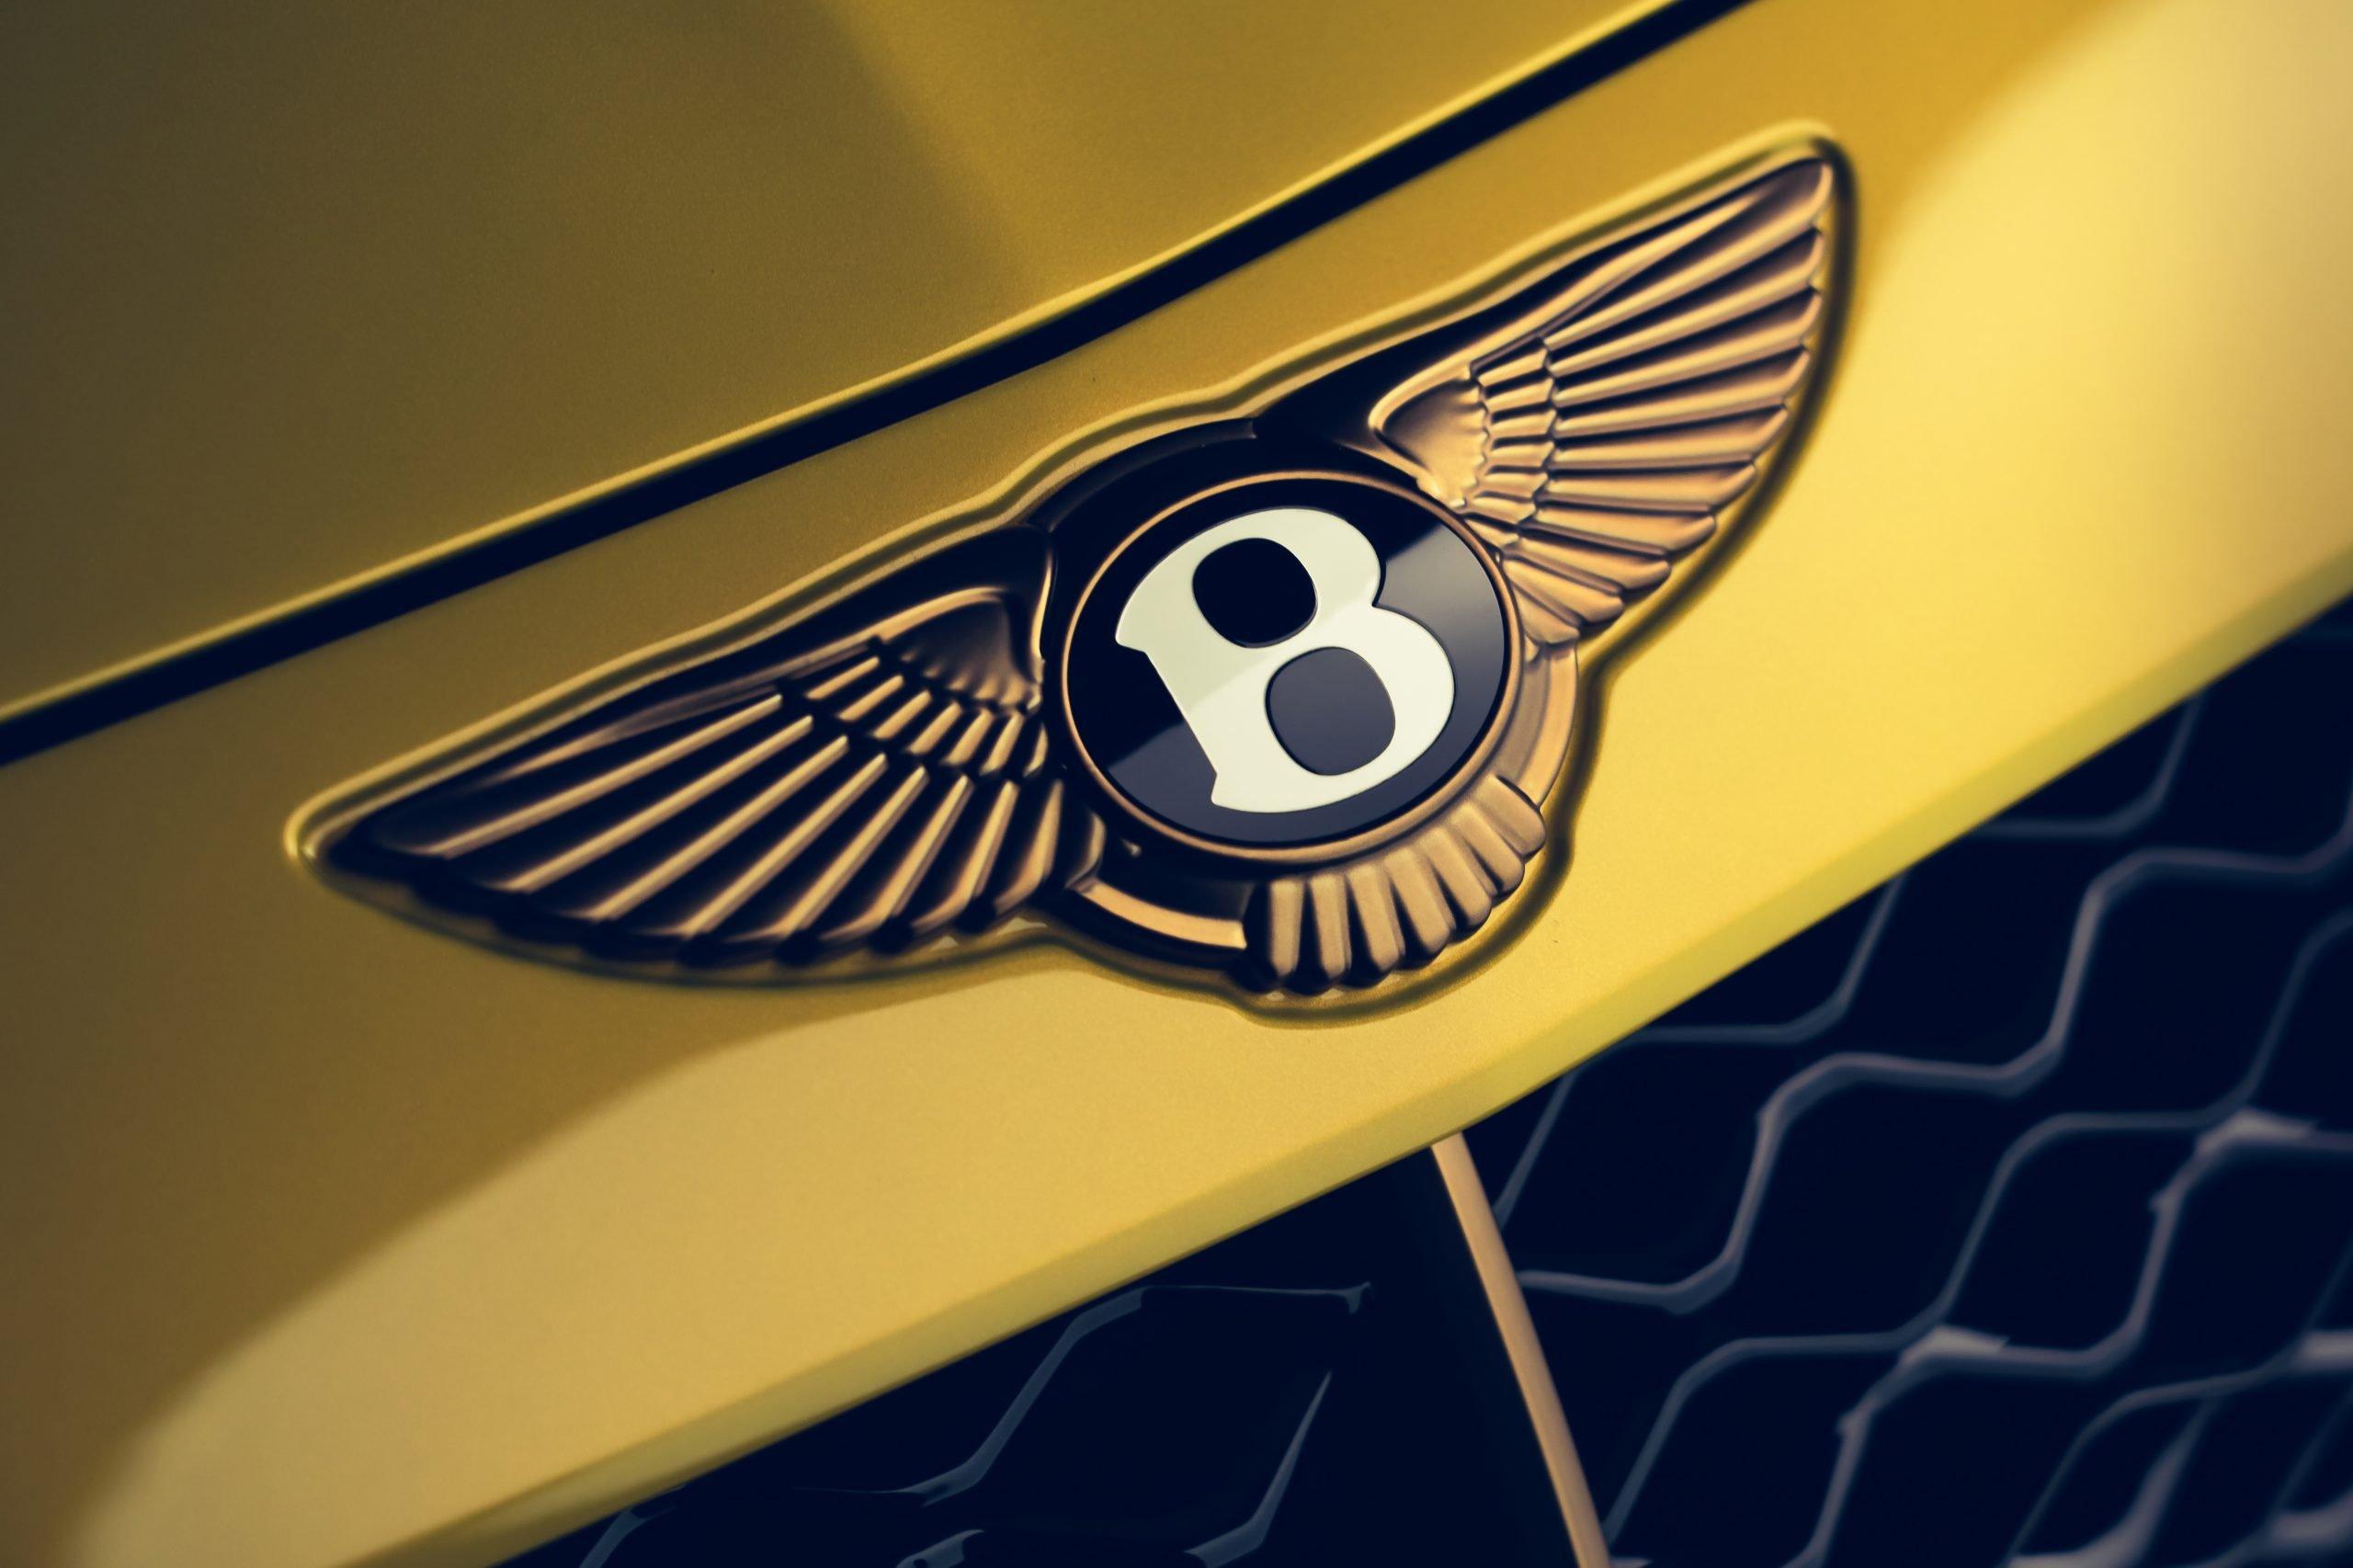 2021 Bentley Bacalar